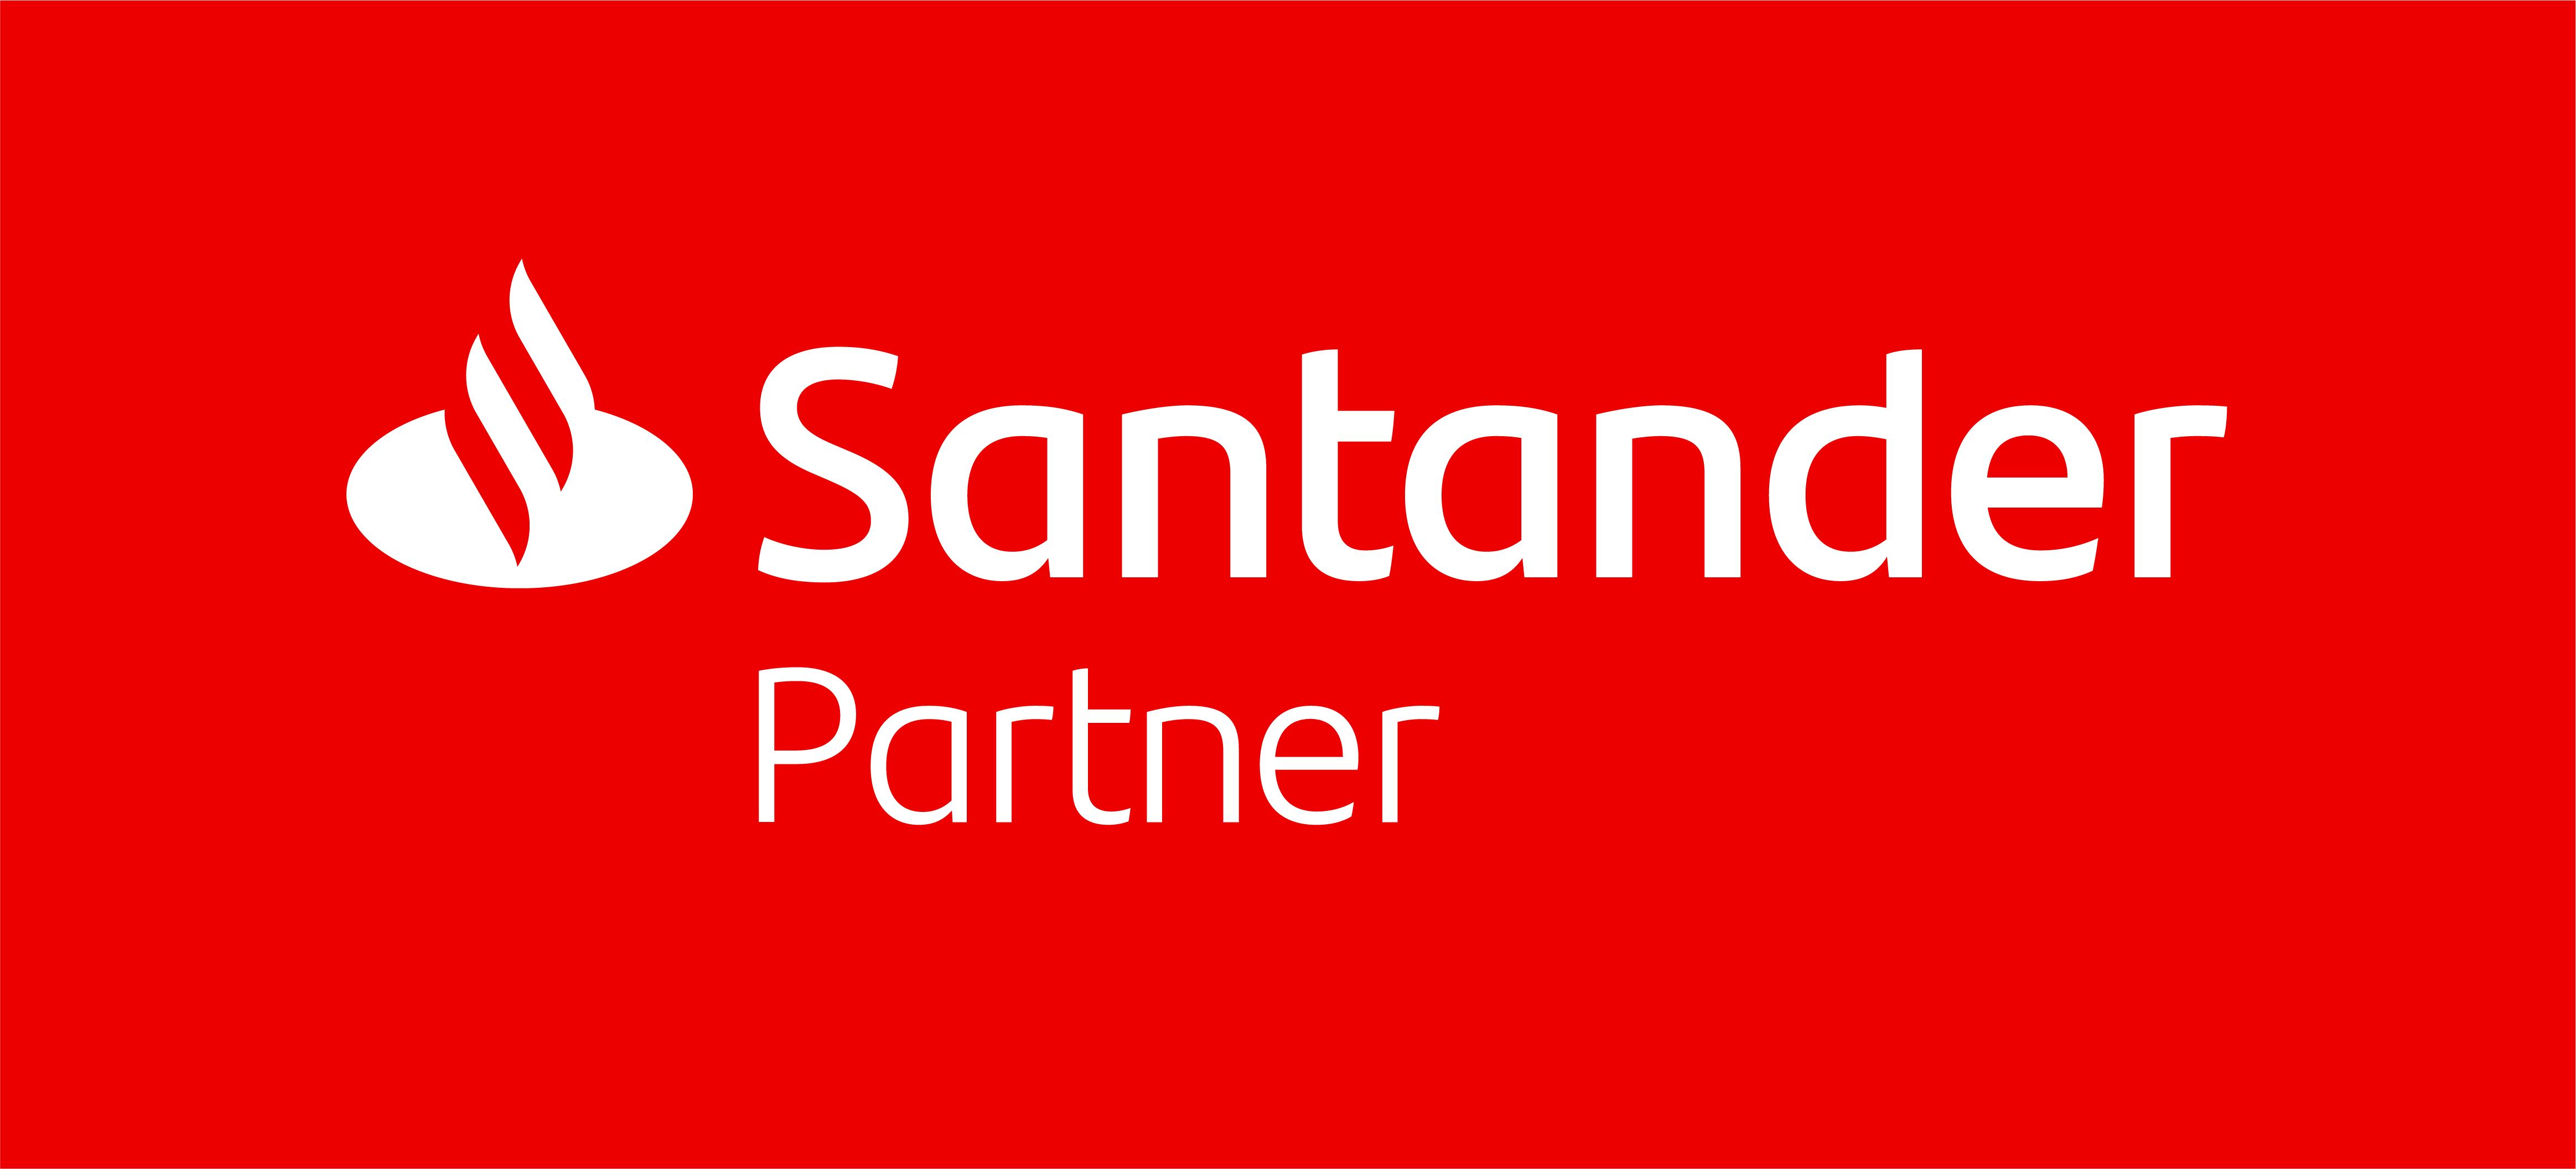 logoSantanderPartnermałe